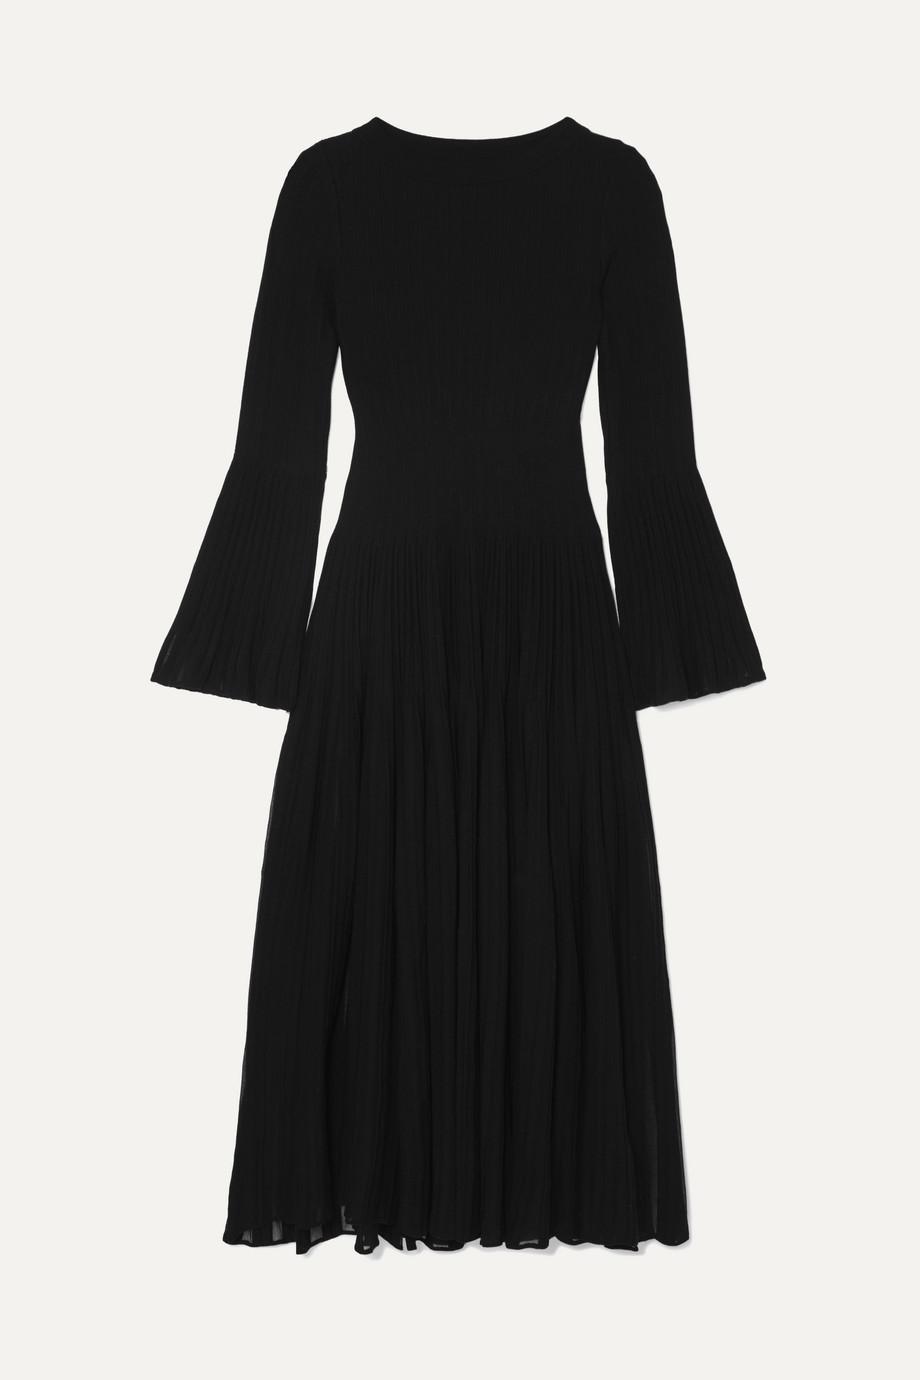 Alaïa Ribbed wool-blend maxi dress